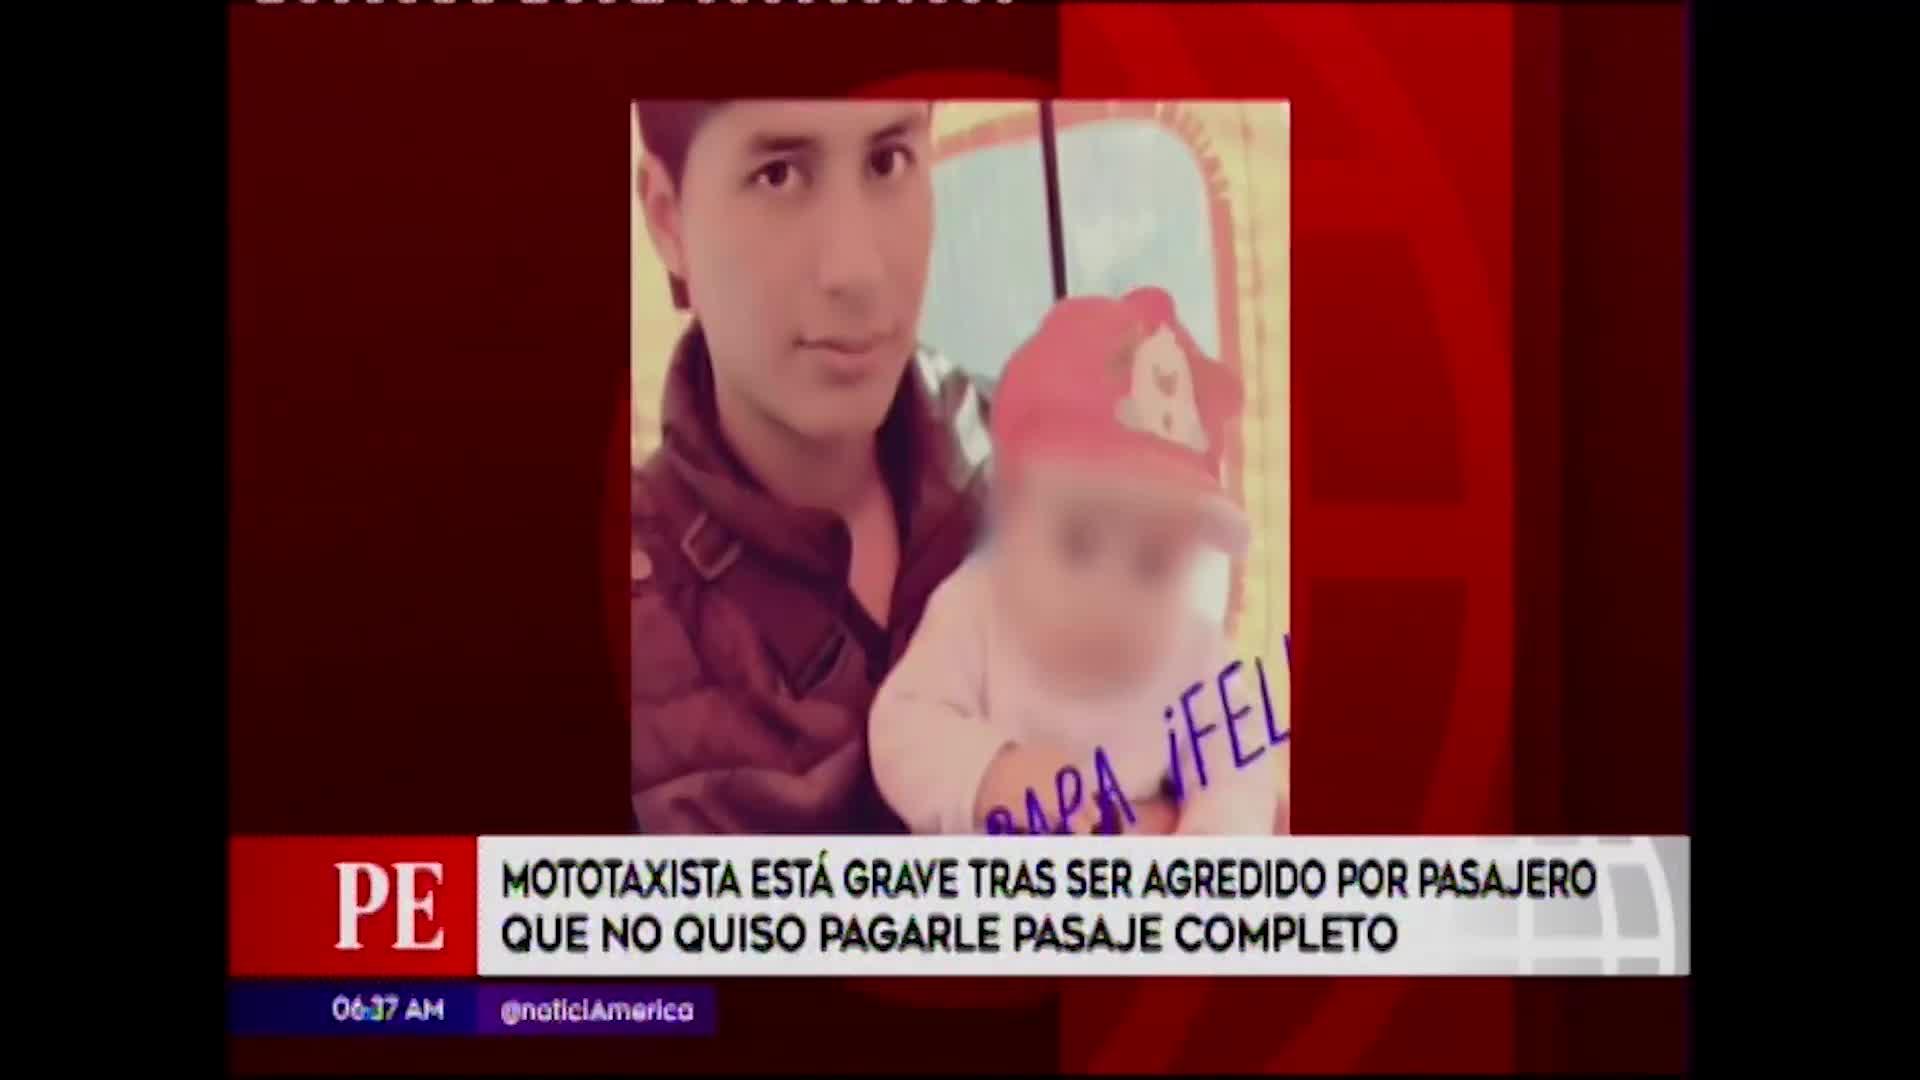 Ate: mototaxista fue agredido por pasajero que no quiso pagarle pasaje